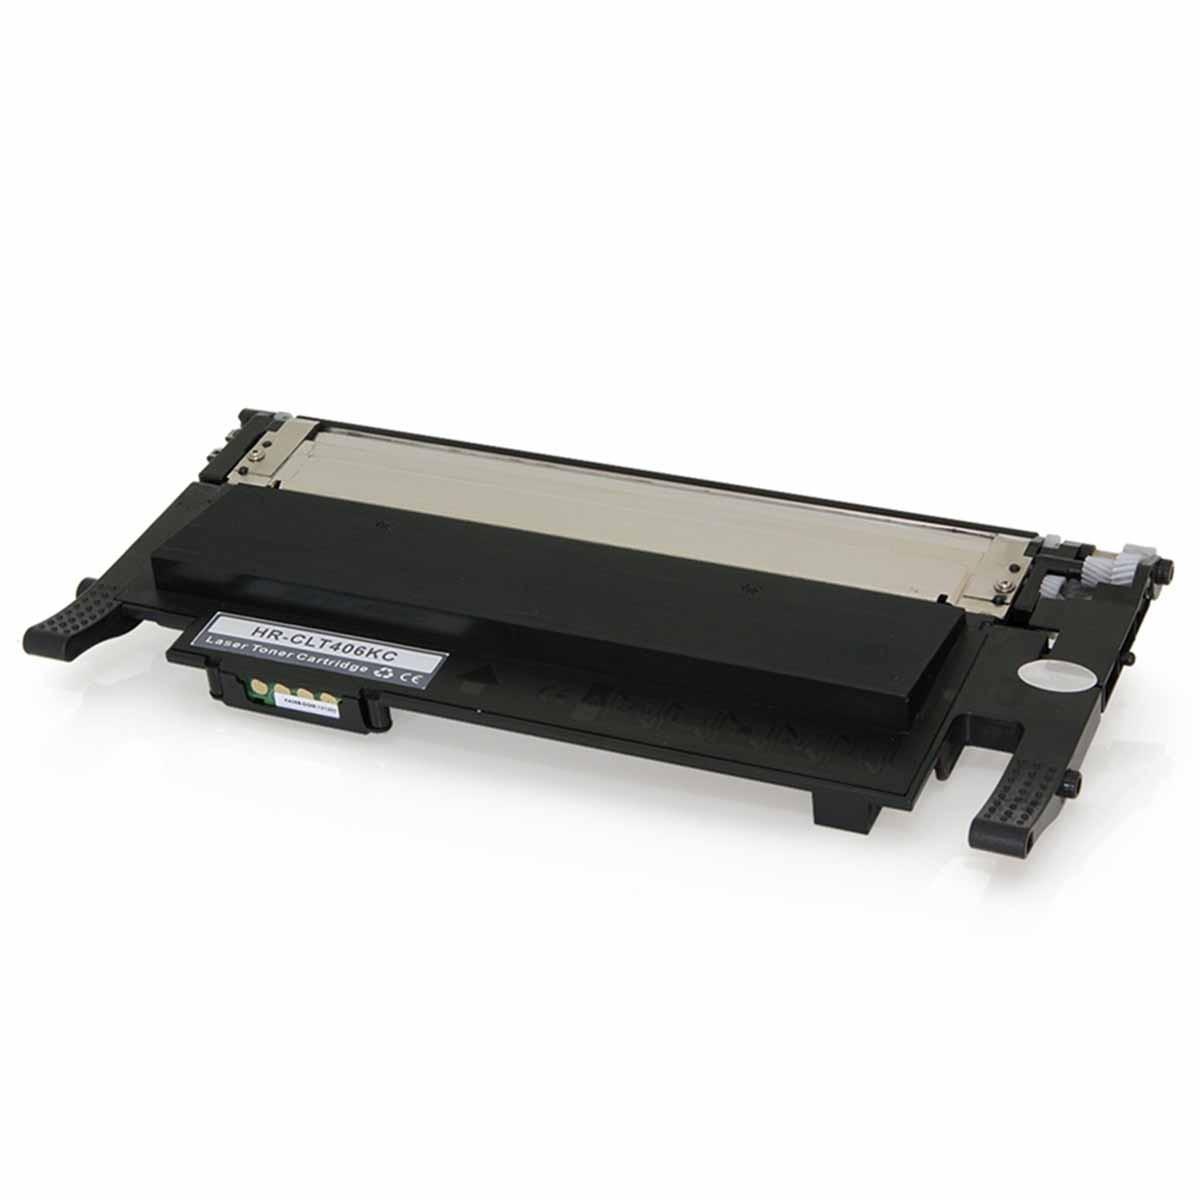 CARTUCHO SAMSUNG CLT-K406S/XAZ BLACK (COMPATIVEL)